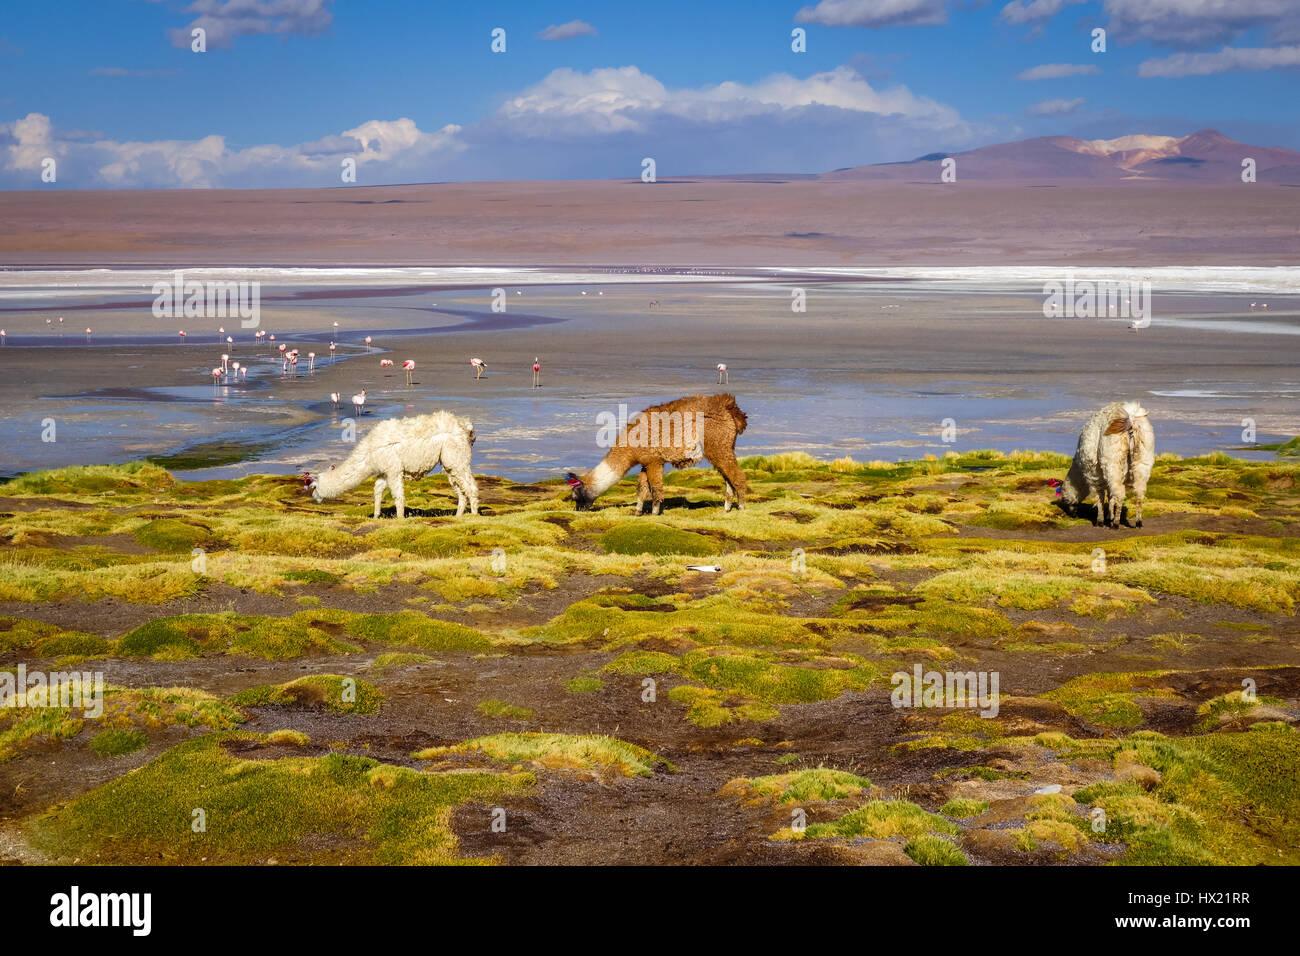 Lamas herd in Laguna colorada, sud Lipez Altiplano reserva Eduardo Avaroa, Bolivia Stock Photo